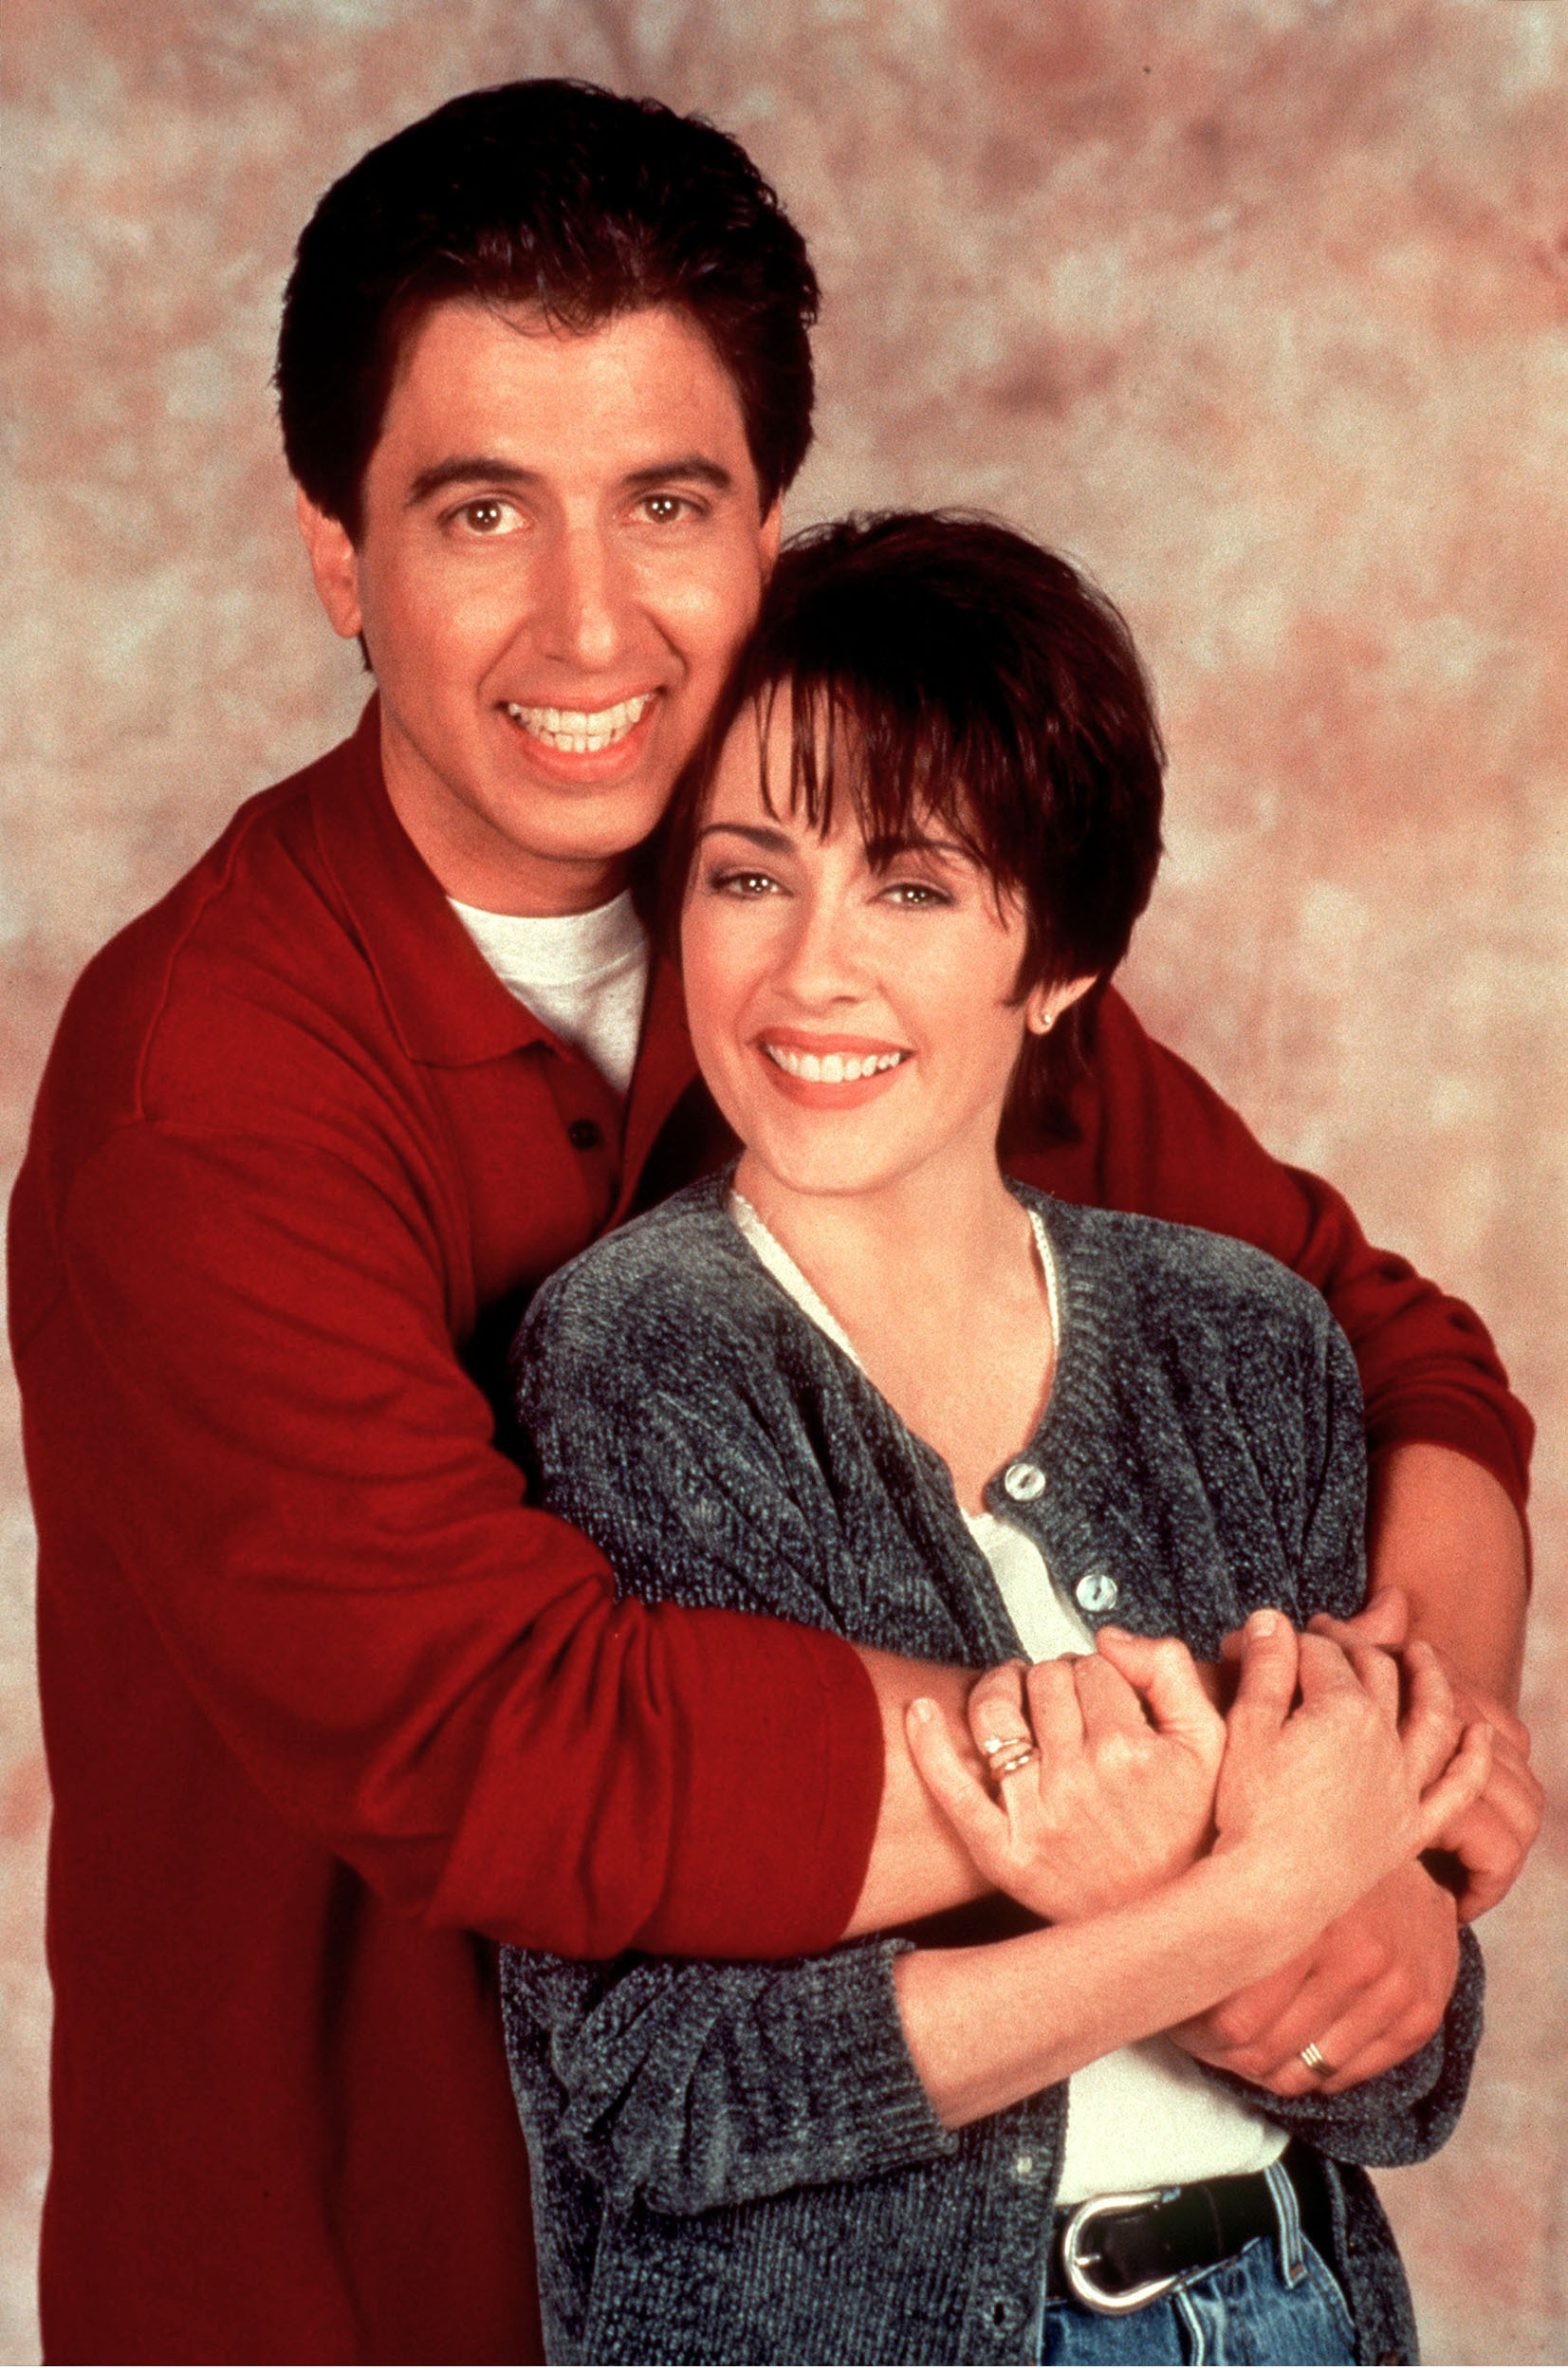 Debra From Everybody Loves RaymondPatricia Heaton Everybody Loves Raymond Season 1